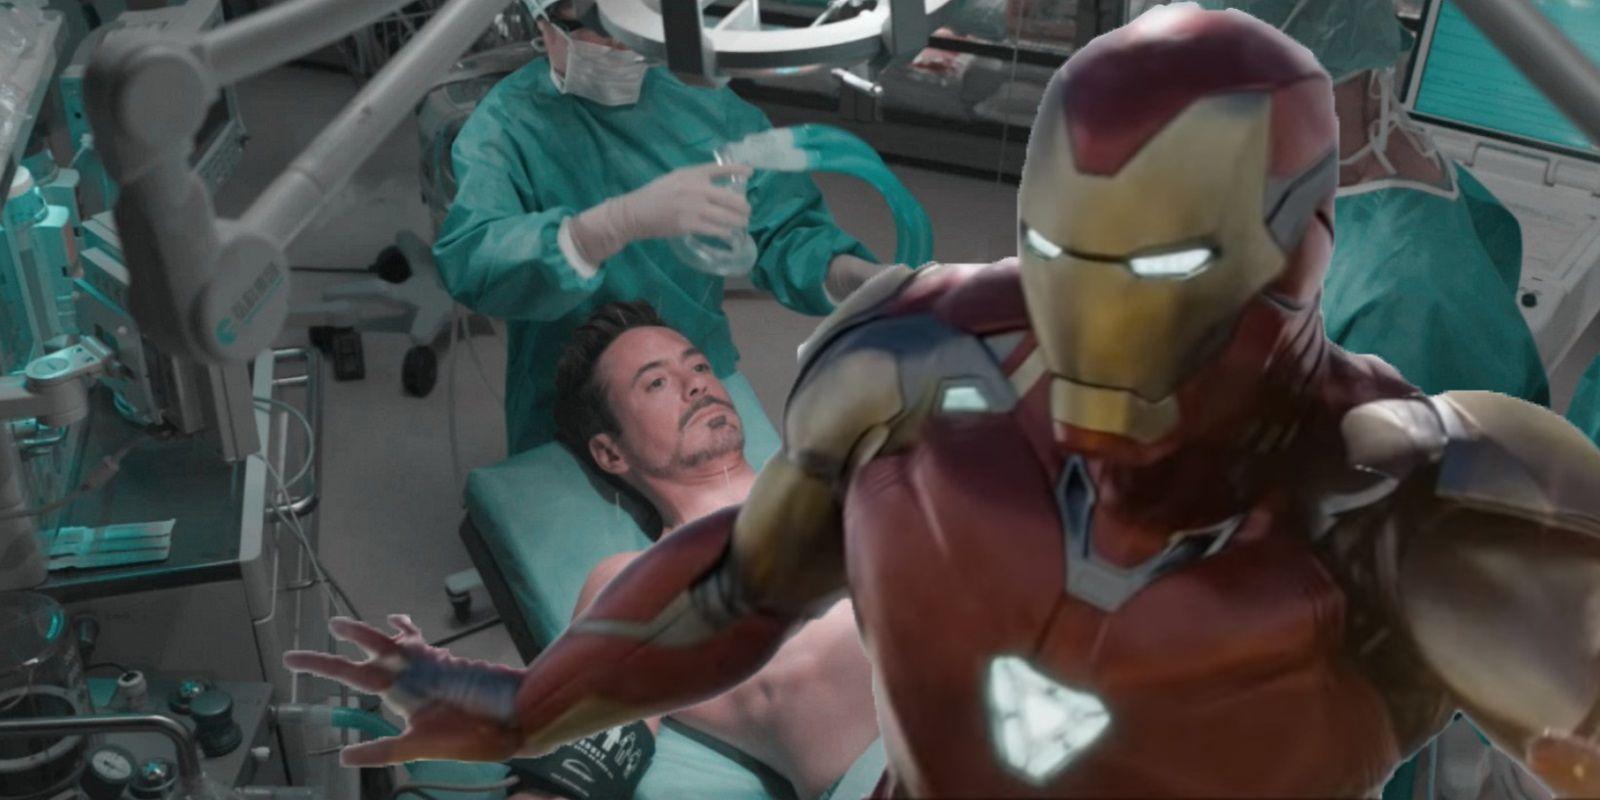 MCU: Why Tony Stark Still Uses An Arc Reactor After Iron Man 3